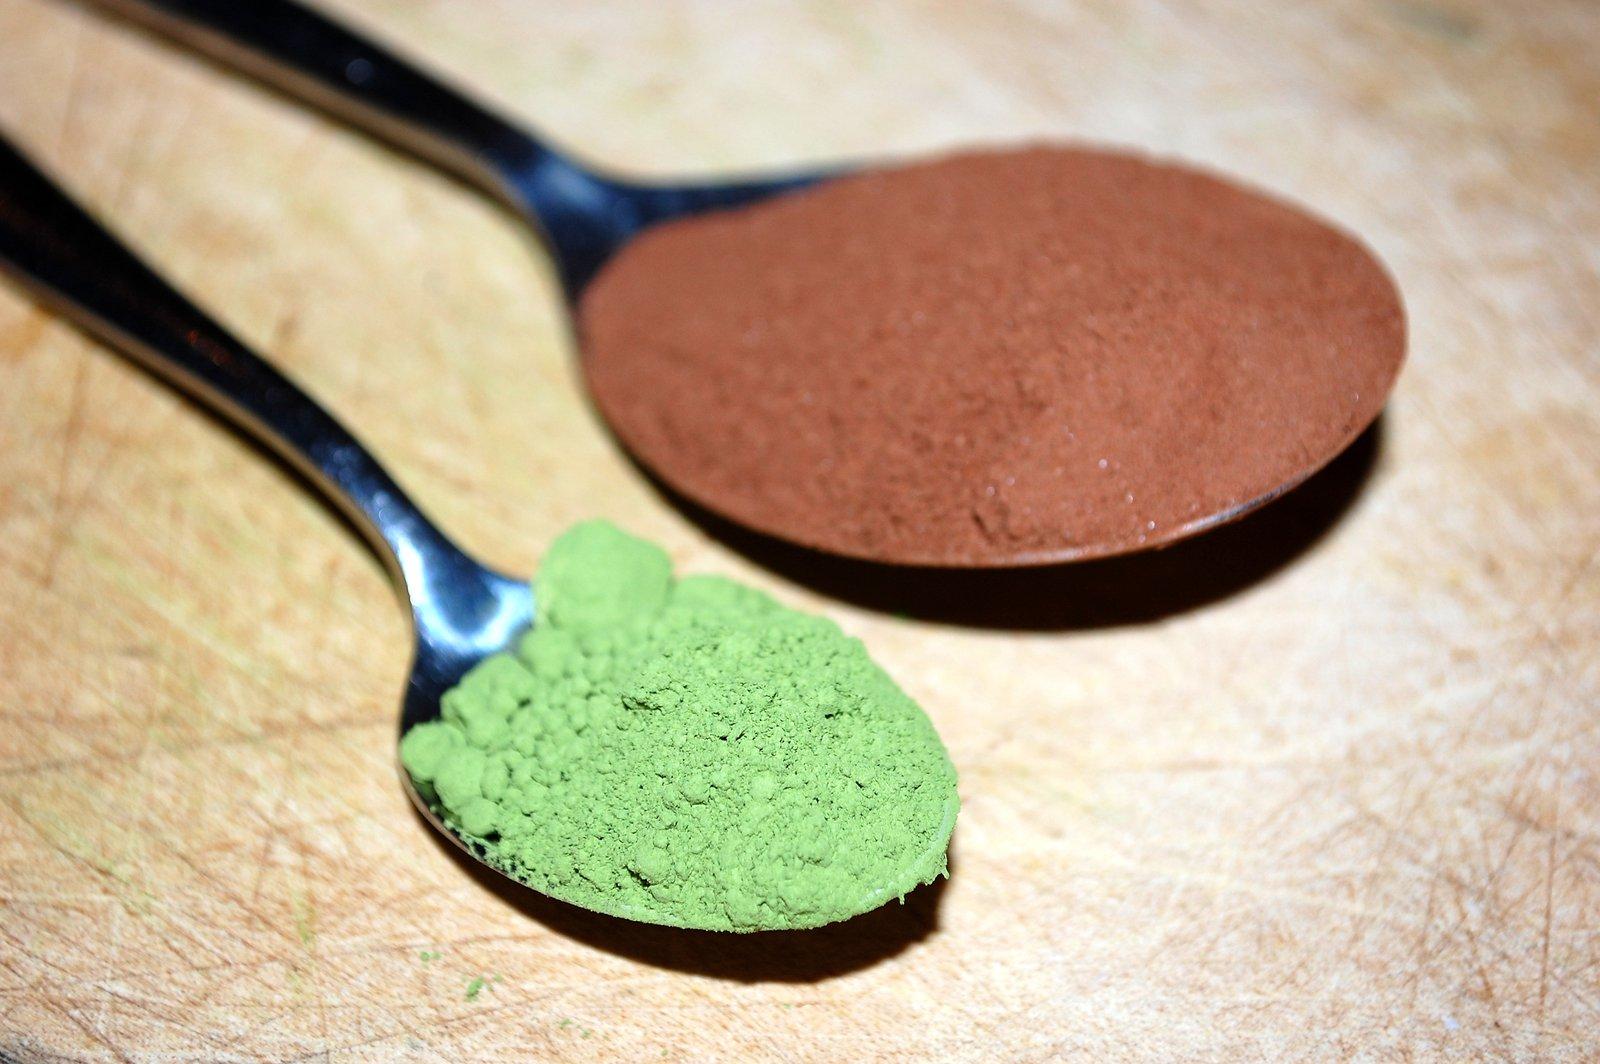 Steenbergs Matcha Tea And Cocoa Powder